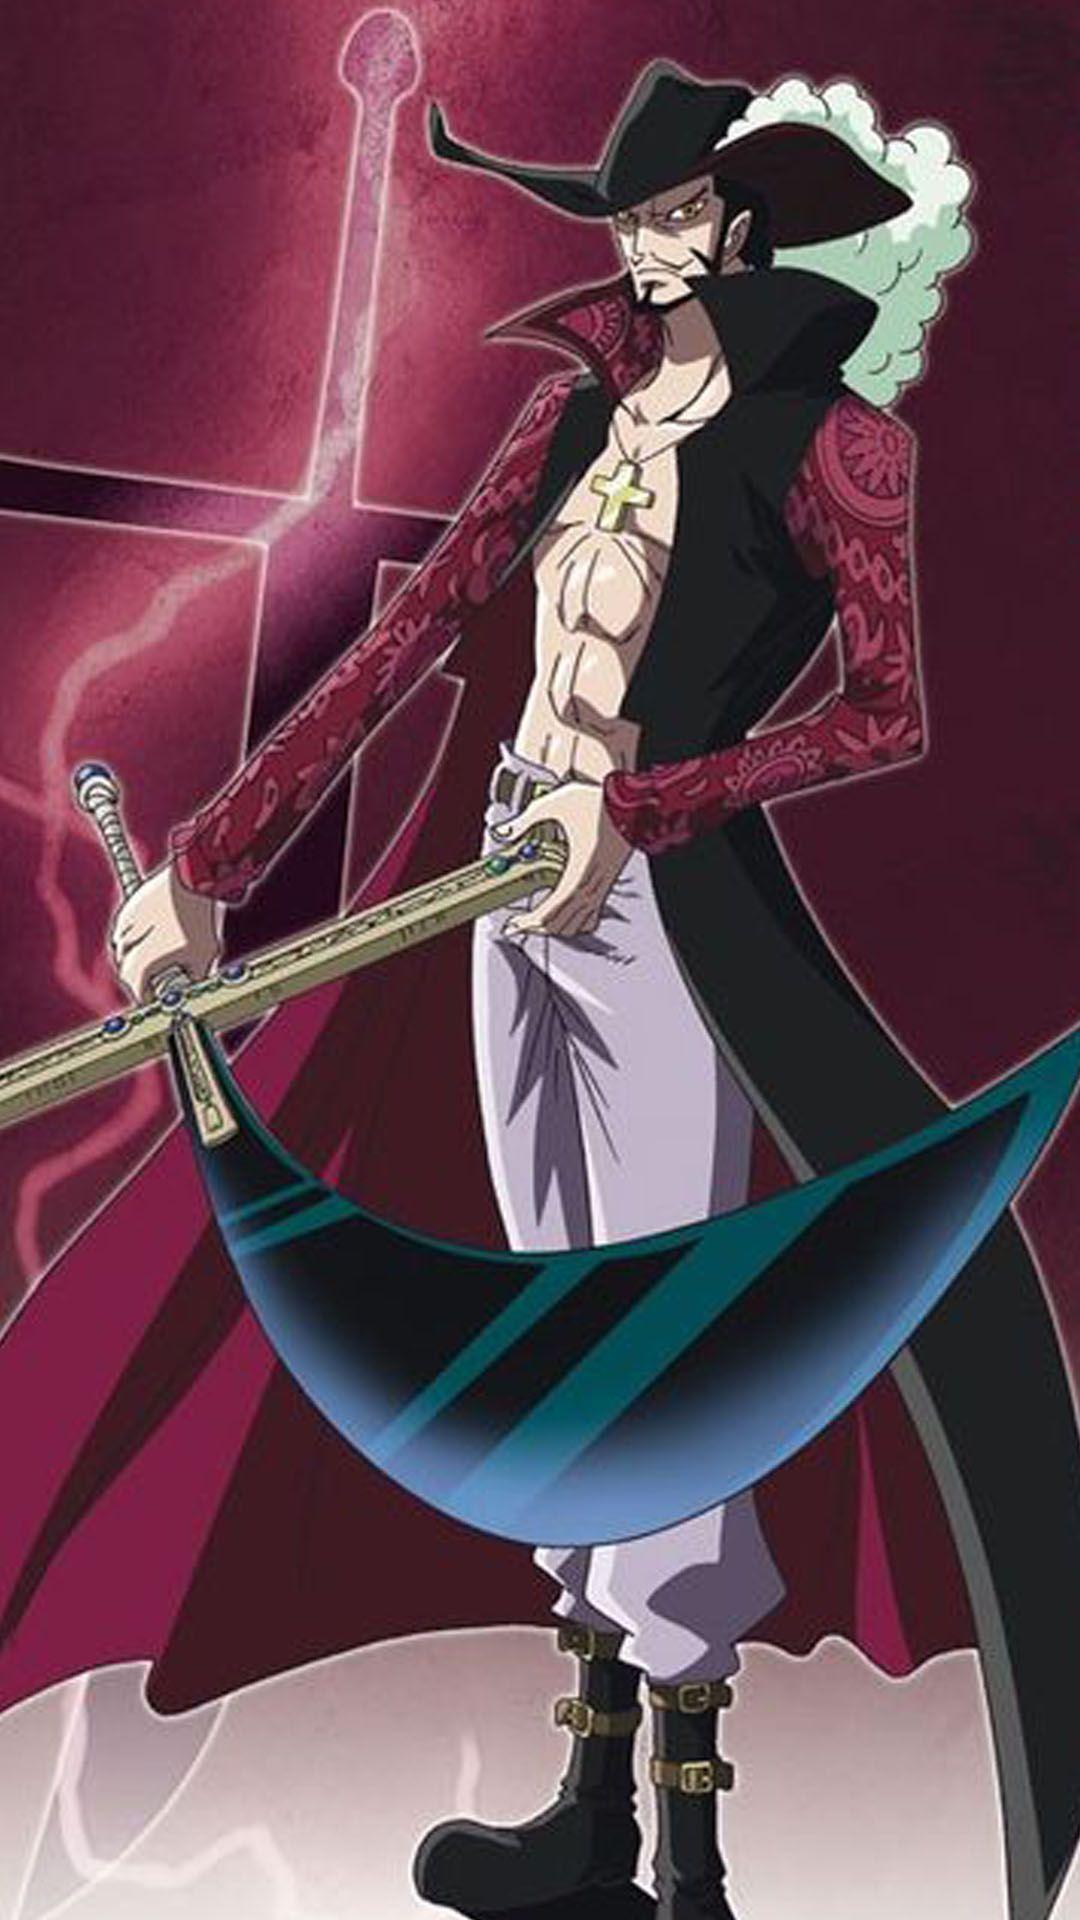 Mihawk Wallpaper 31 One Piece Anime One Piece Luffy One Piece